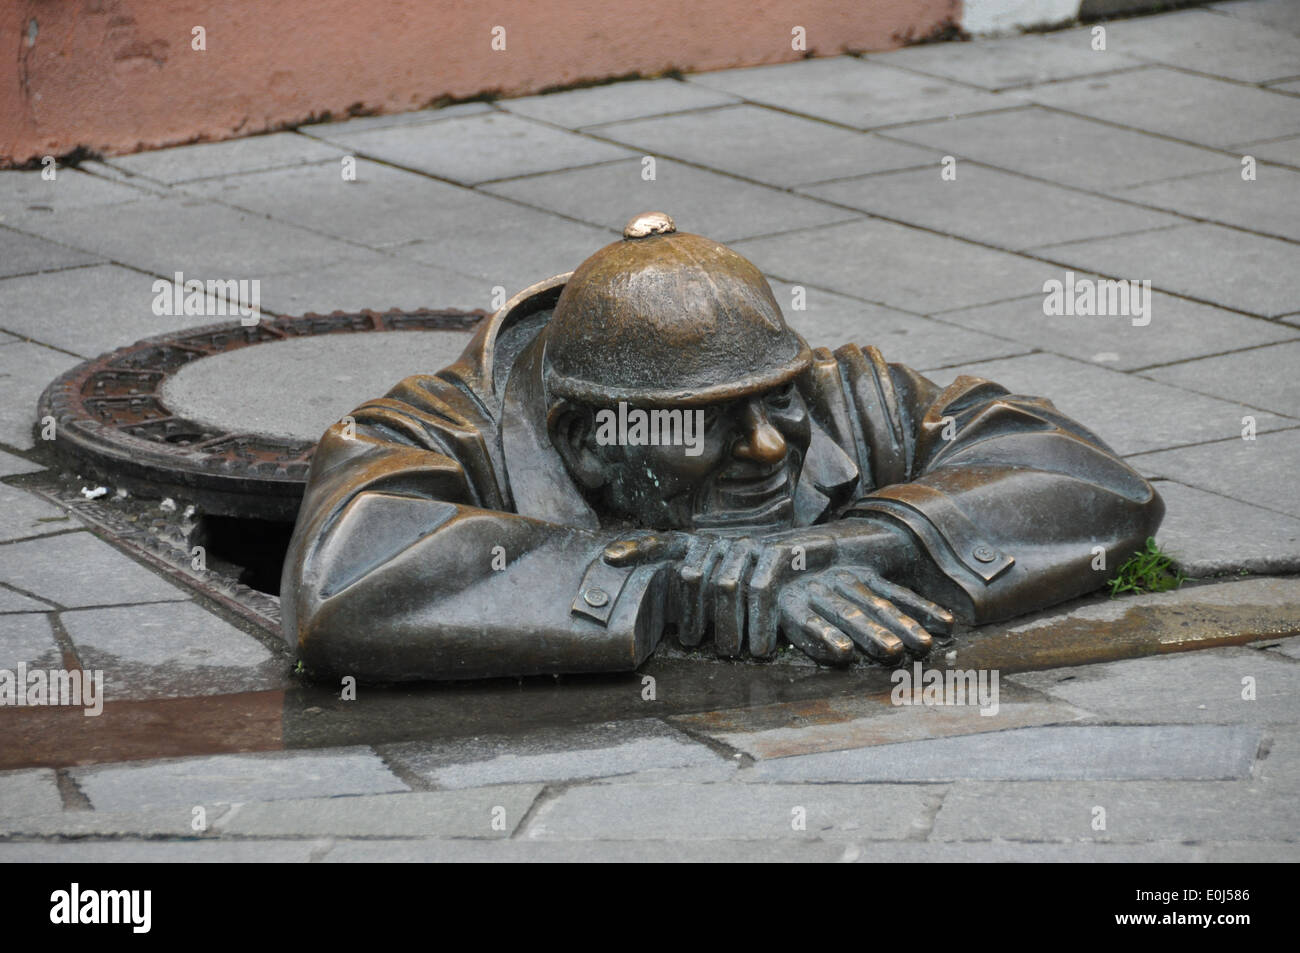 A bronze statue of man in manhole bratislava s old